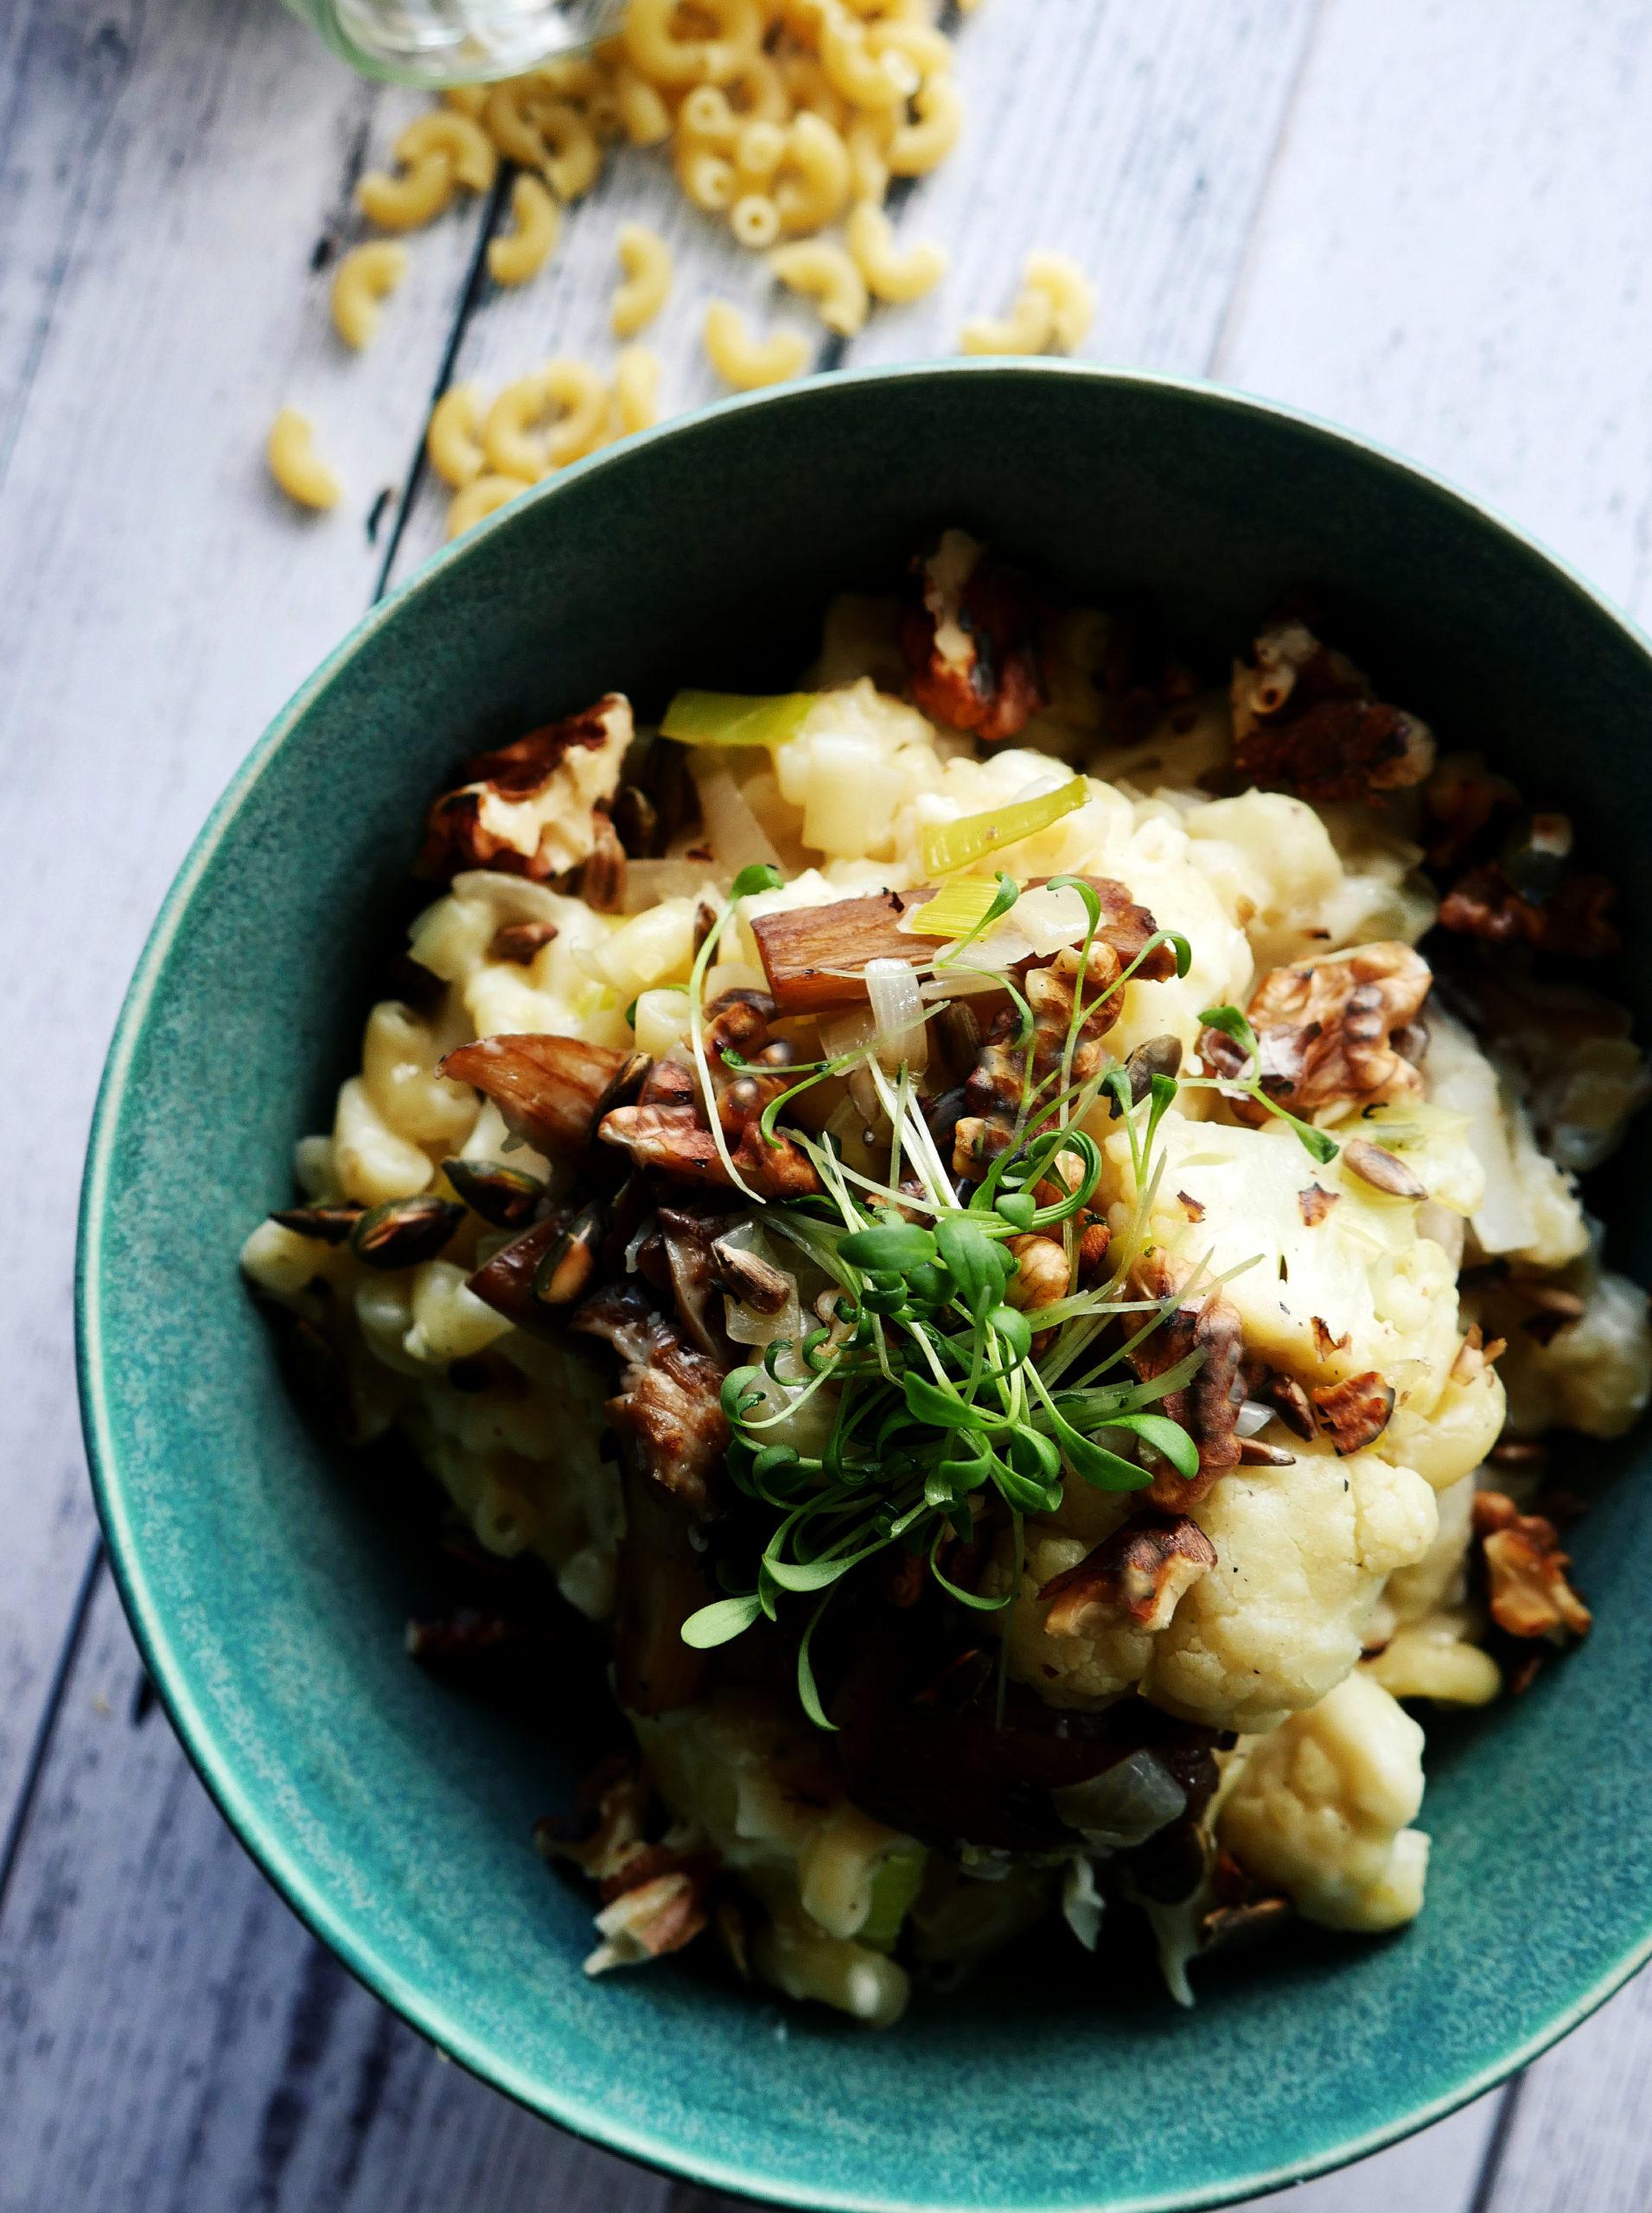 vegetarische macaroni bloemkool prei bechamelsaus oesterzwammen seizoensgroenten september